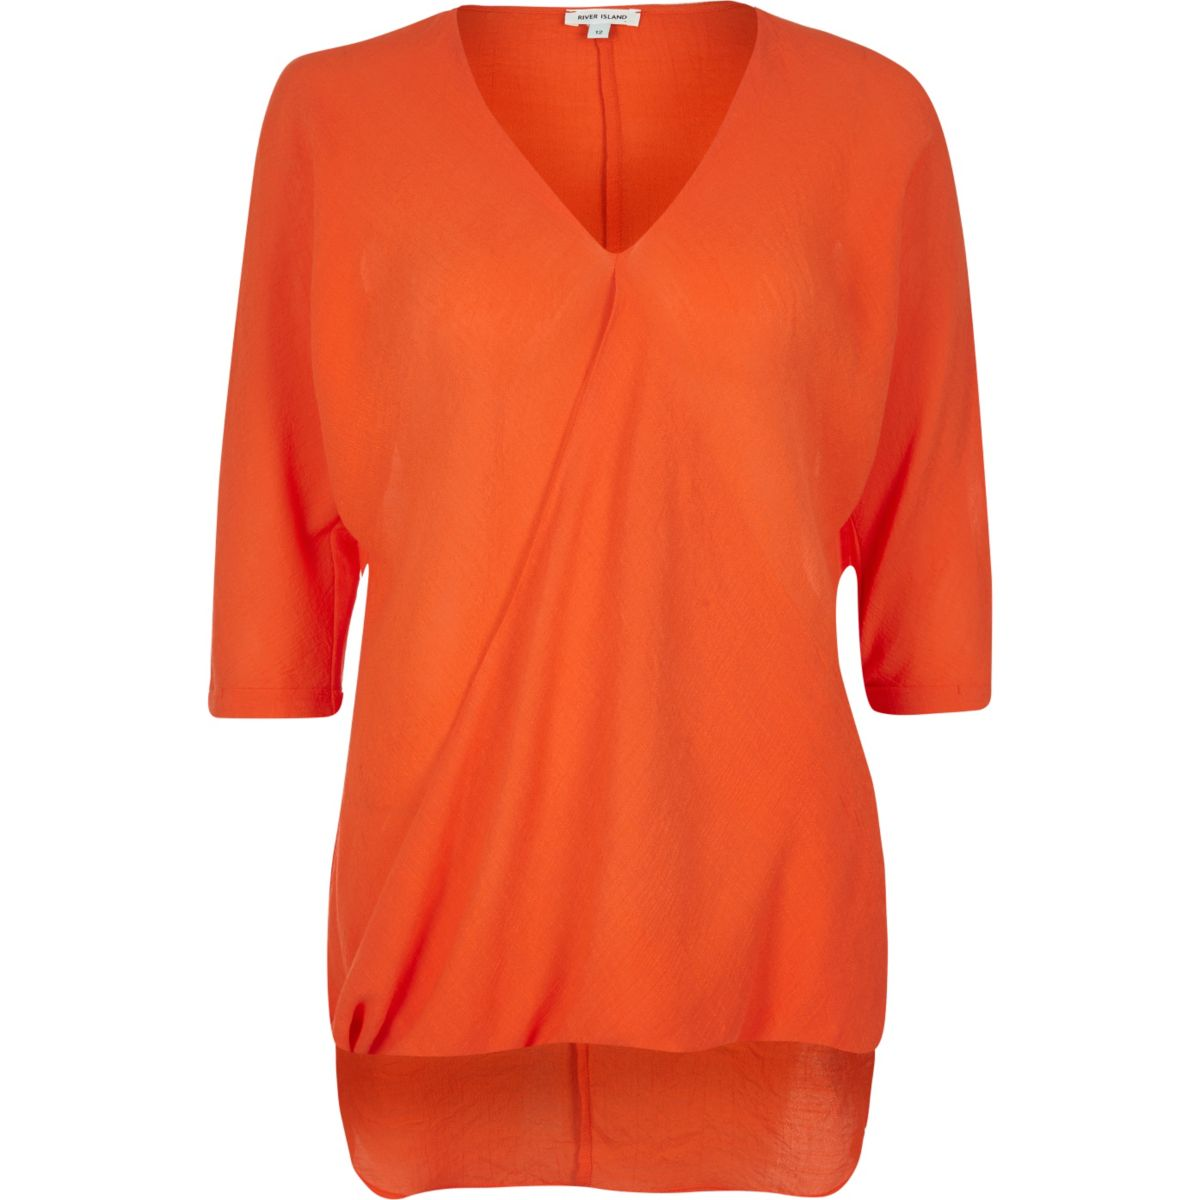 Orange wrap blouse